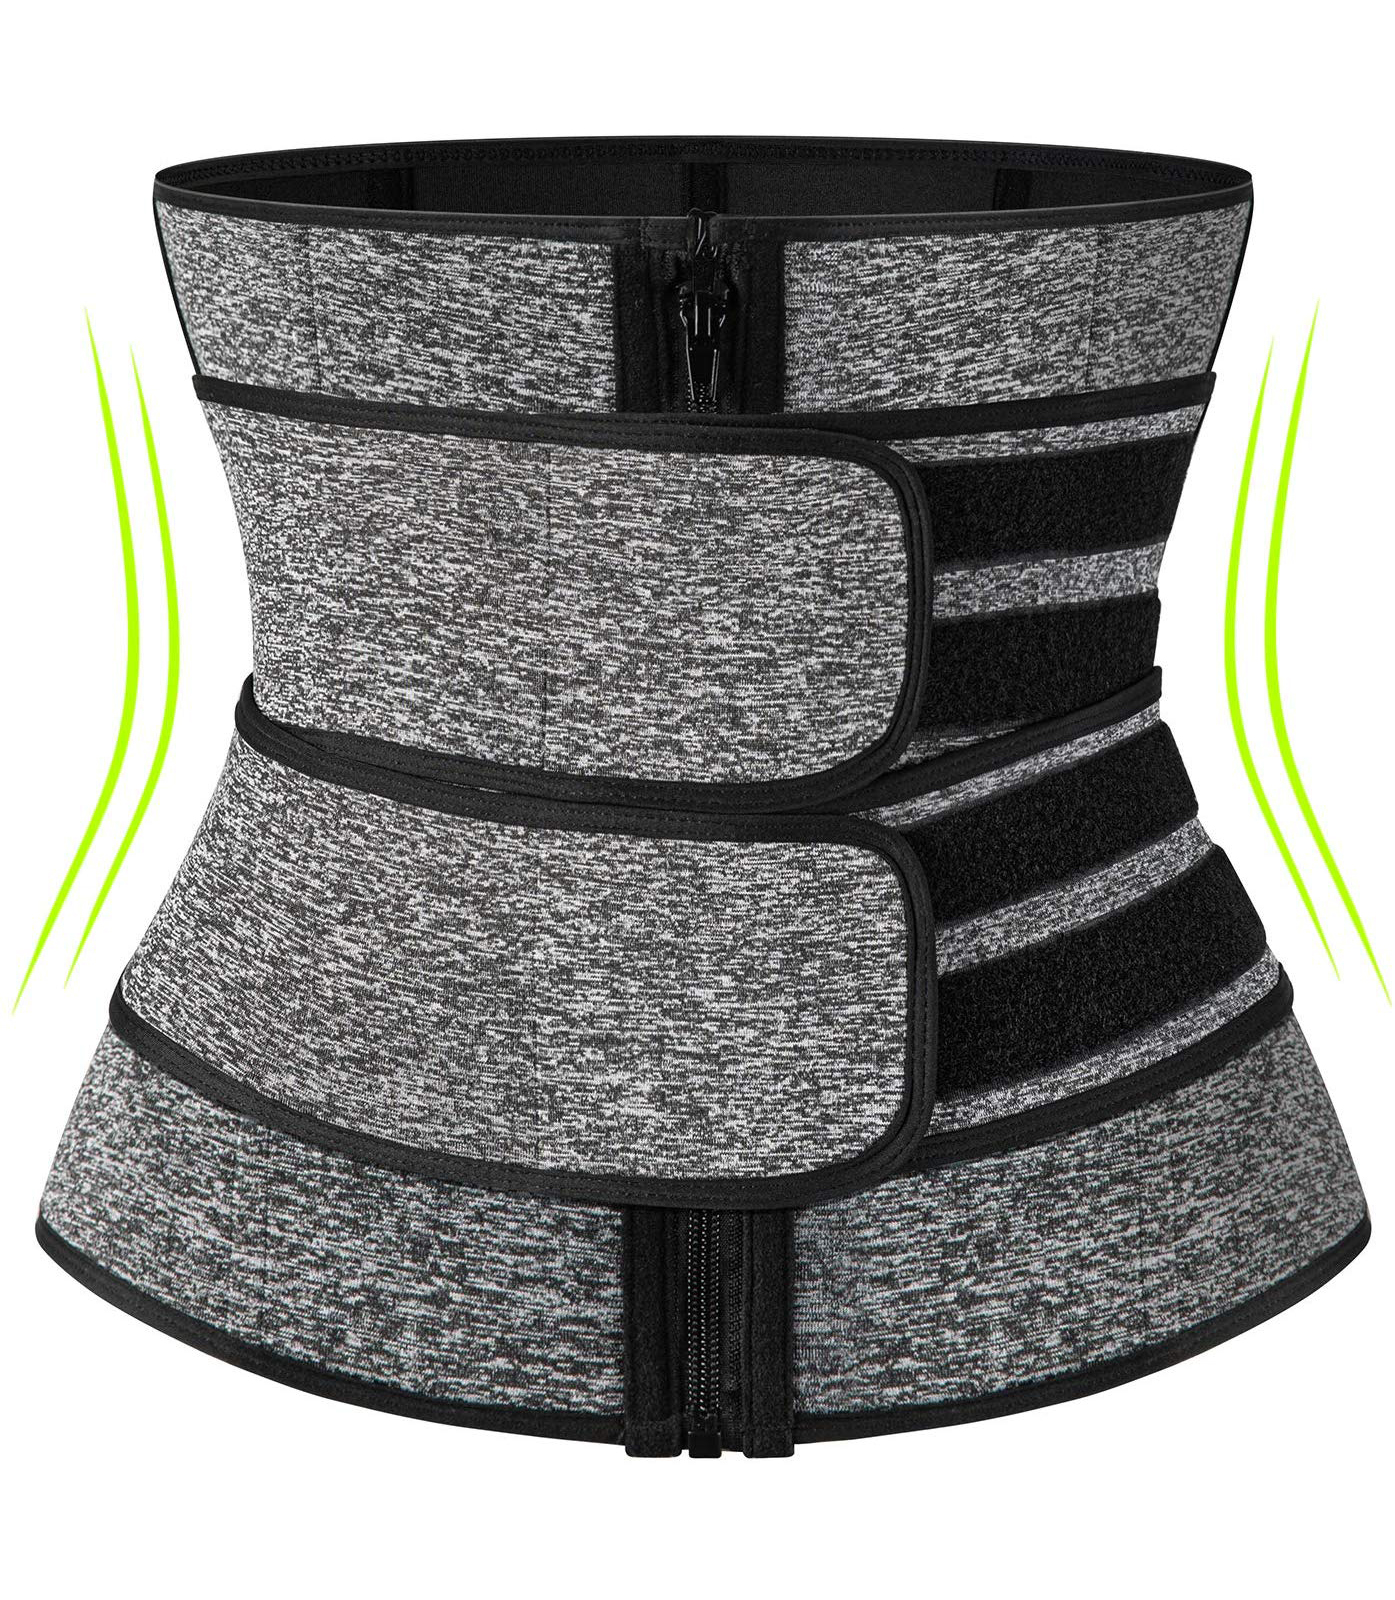 Neoprene Sauna Waist Trainer Corset Sweat Belt for Women Weight Loss Compression